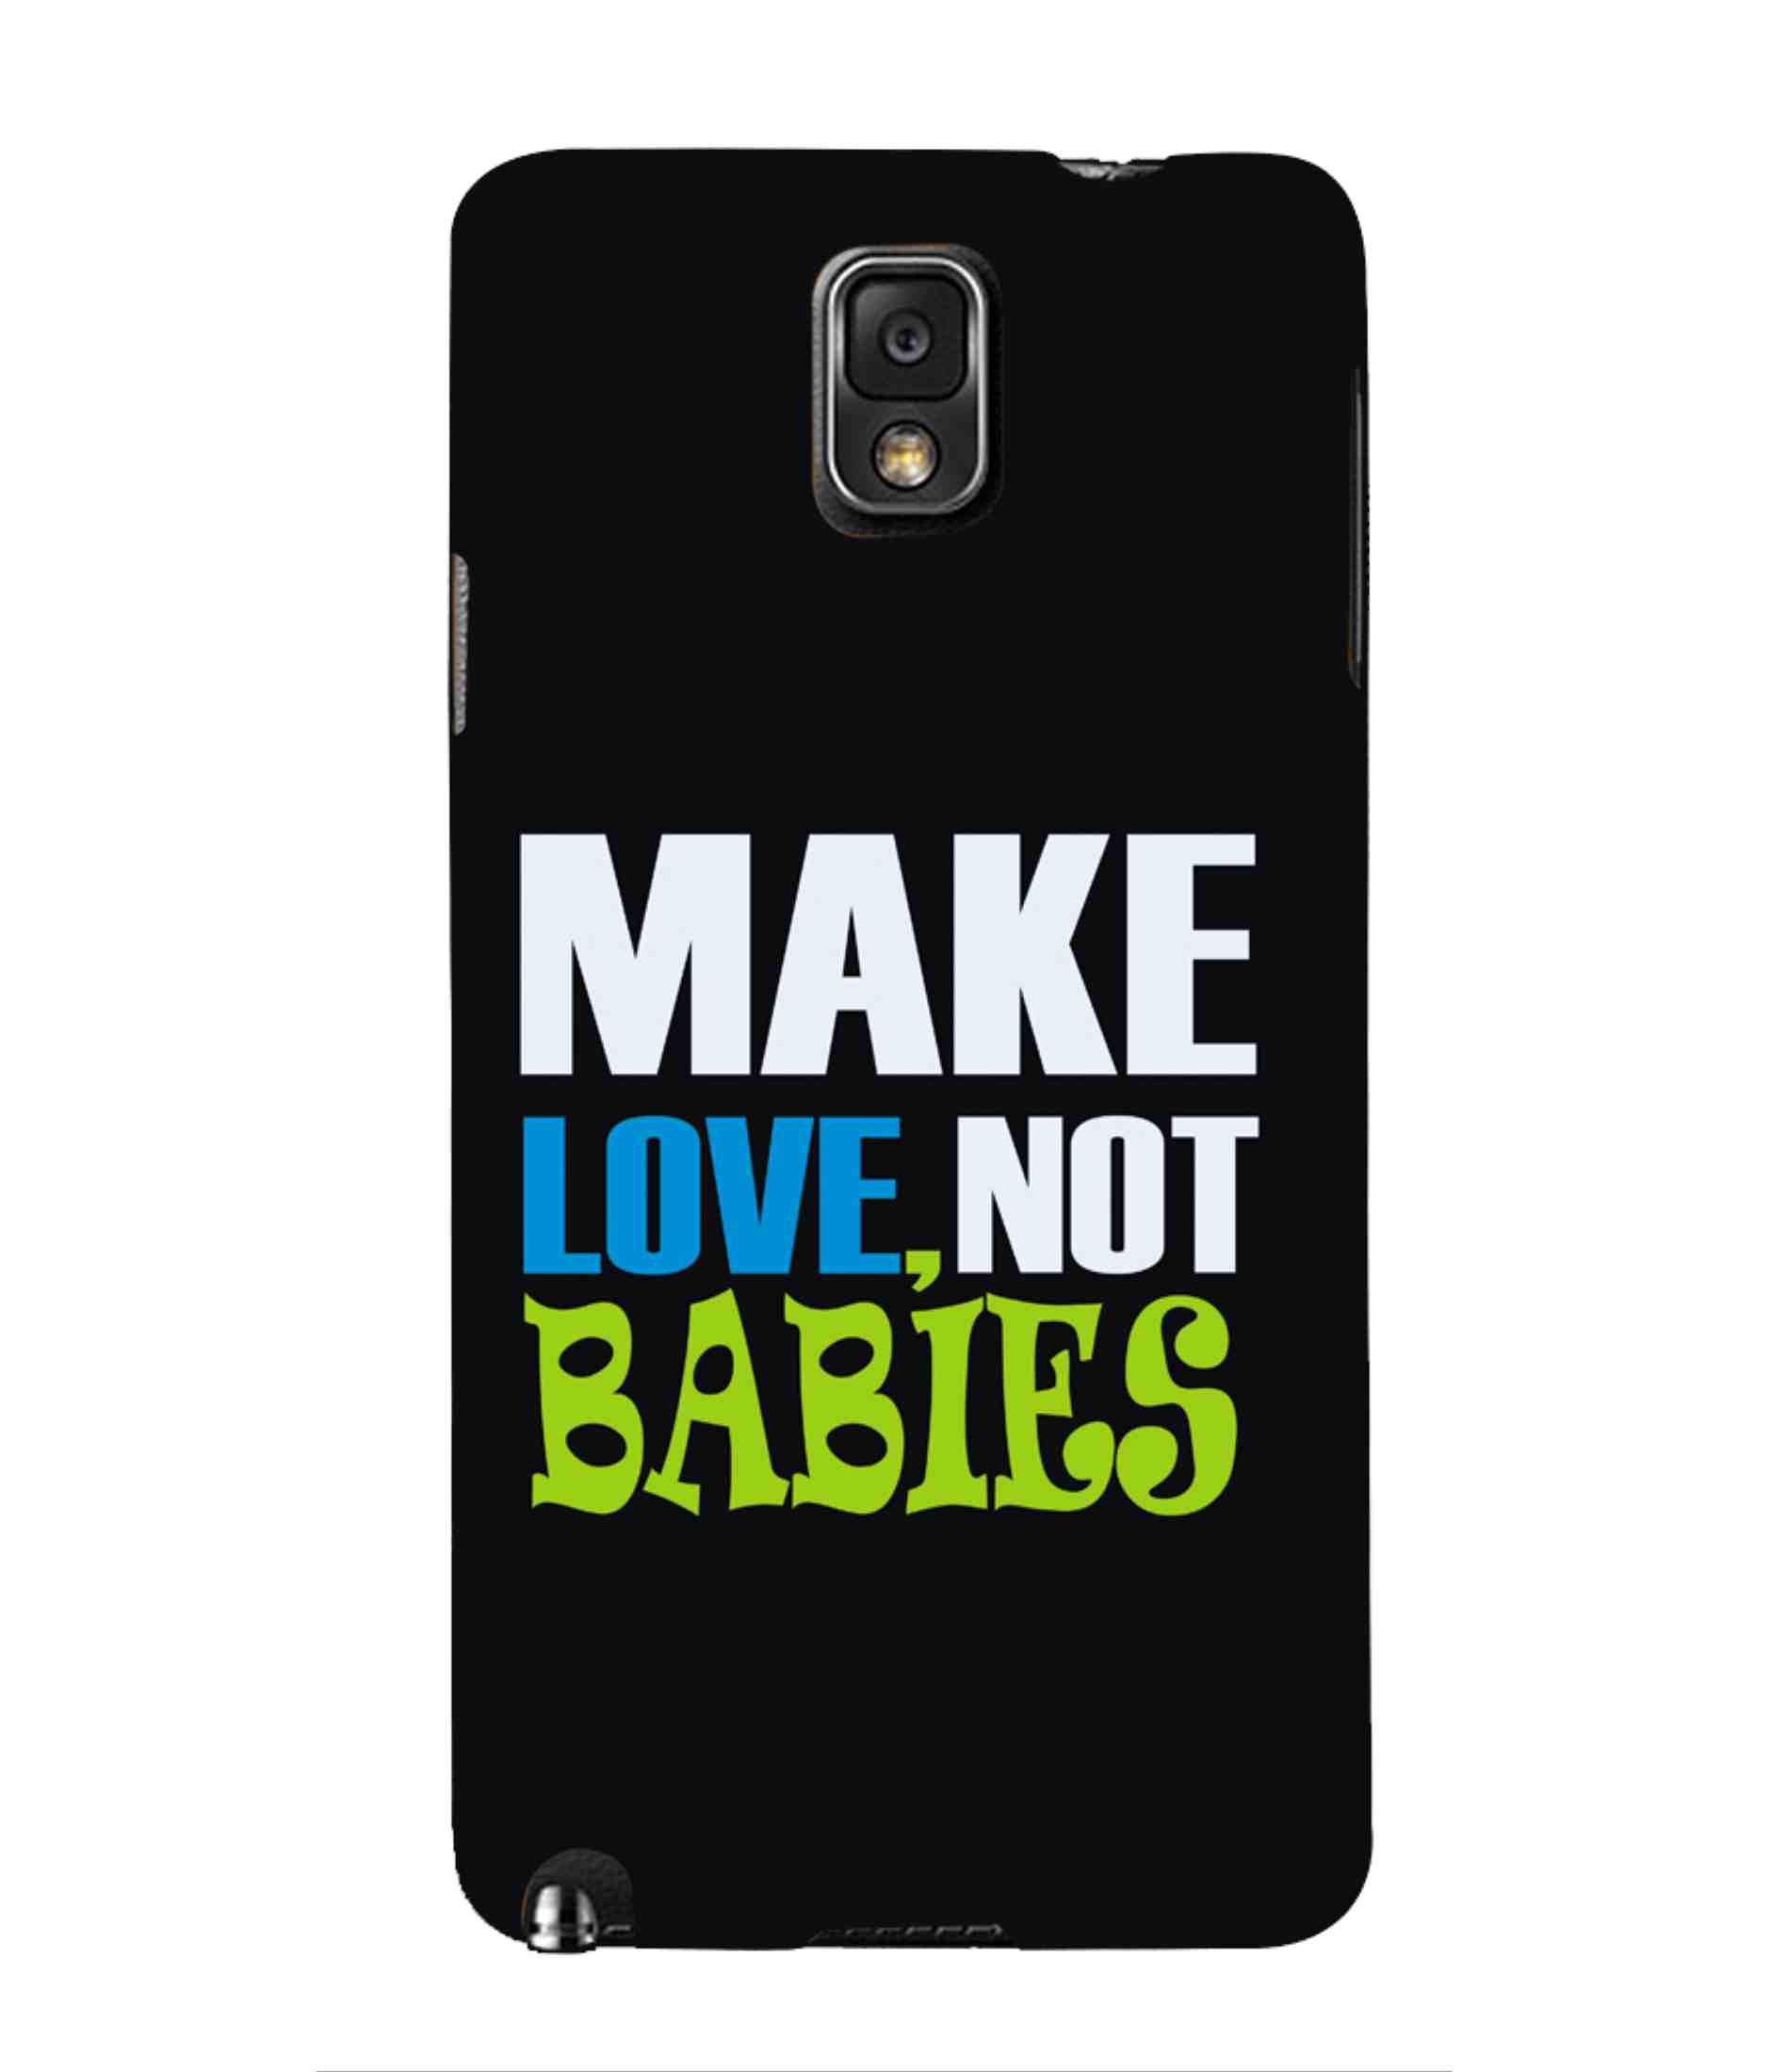 Vibrante Mobile Case Cover For Samsung Galaxy Note 3 , Samsung Galaxy Note Iii , Samsung Galaxy Note 3 N9002 , Samsung Galaxy Note N9000 N9005 28882